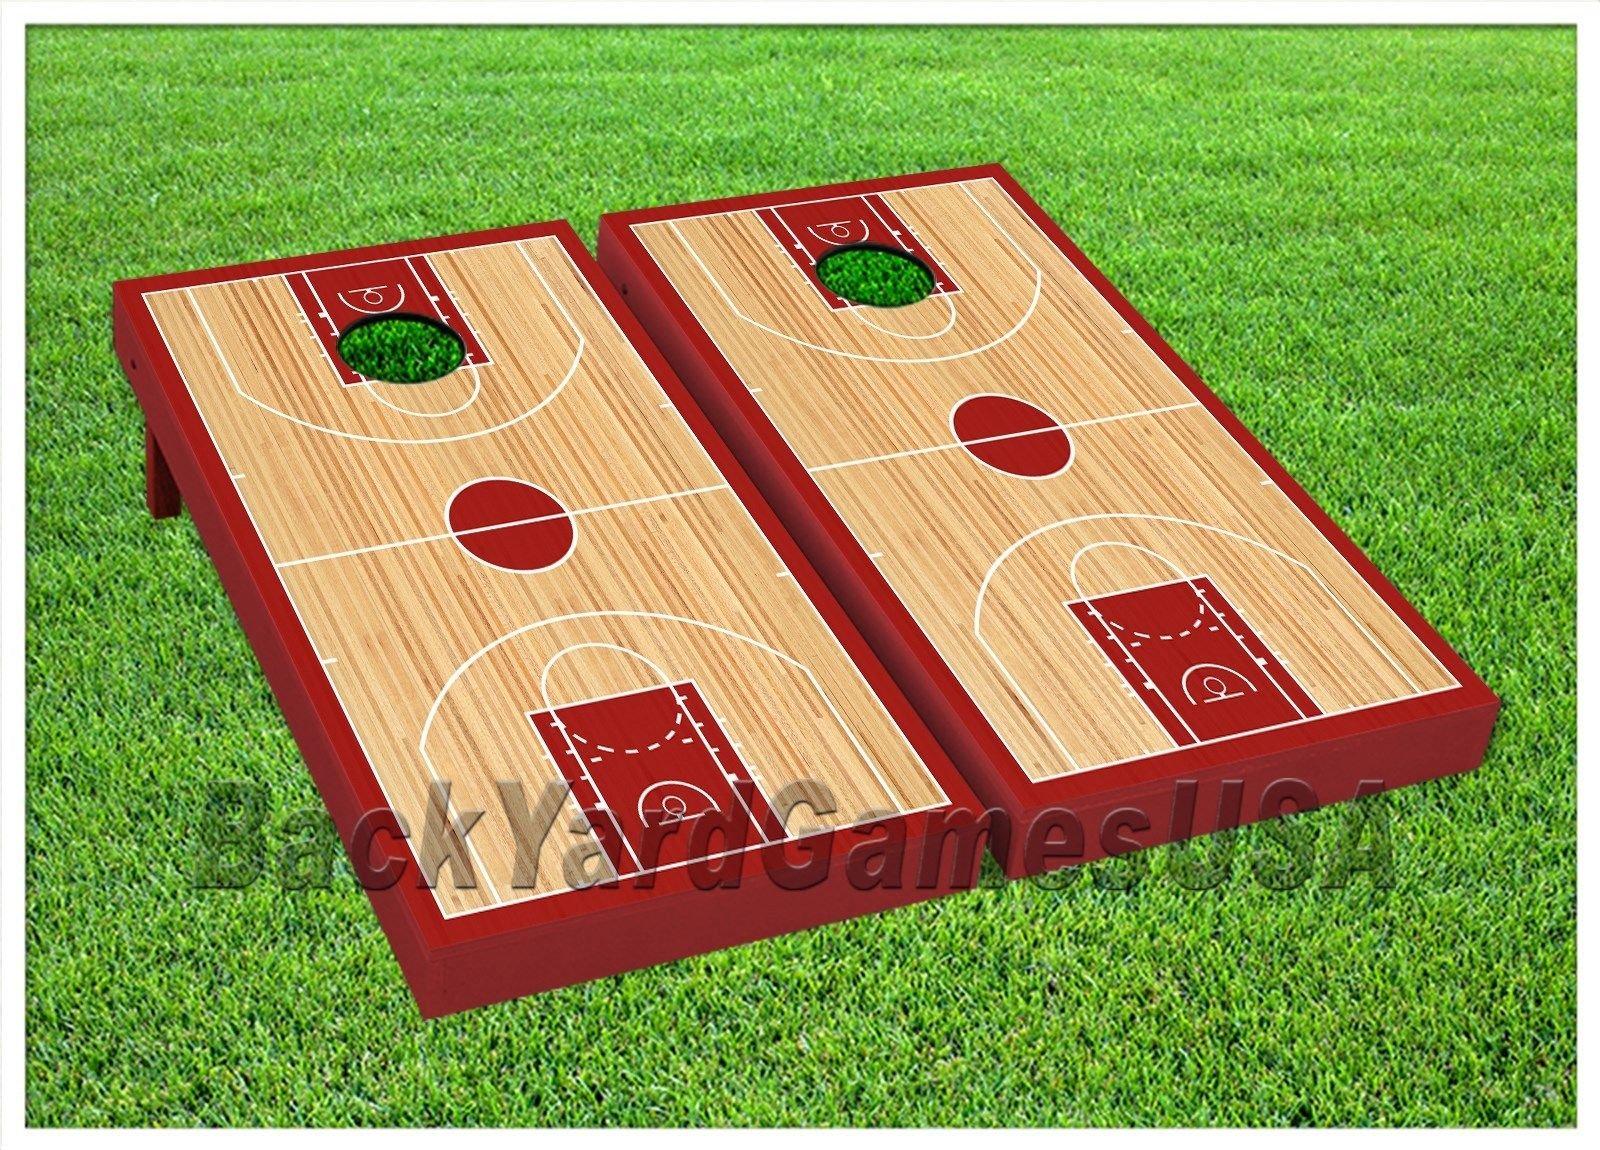 BASKETBALL COURT Cornhole Boards BEANBAG TOSS GAME w Bags NBA Fans Gift Set 314 by BackYardGamesUSA